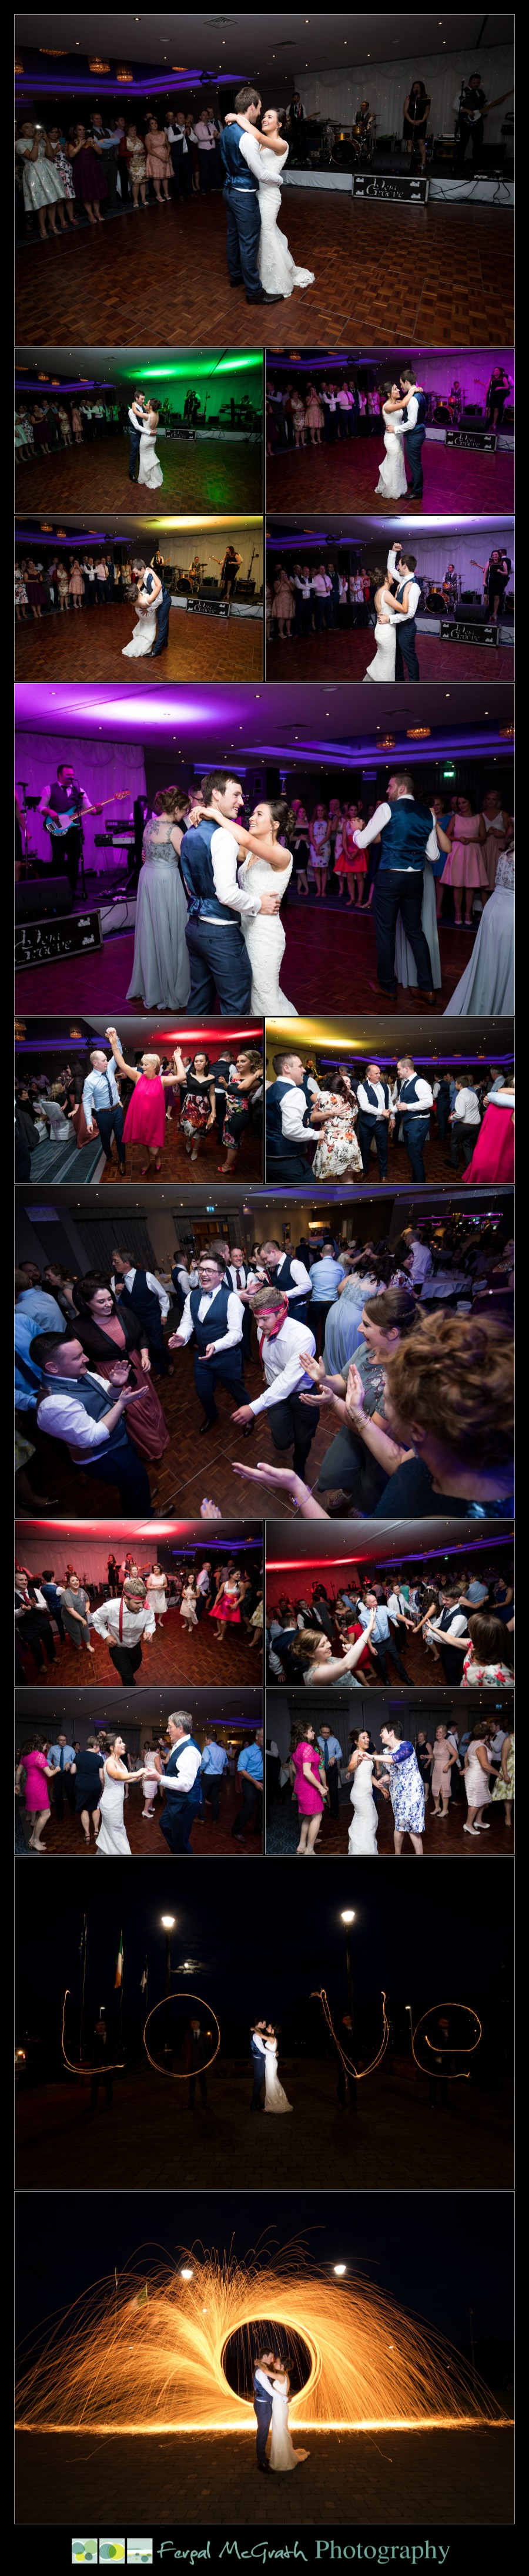 Clayton Hotel Sligo Wedding first dance photos